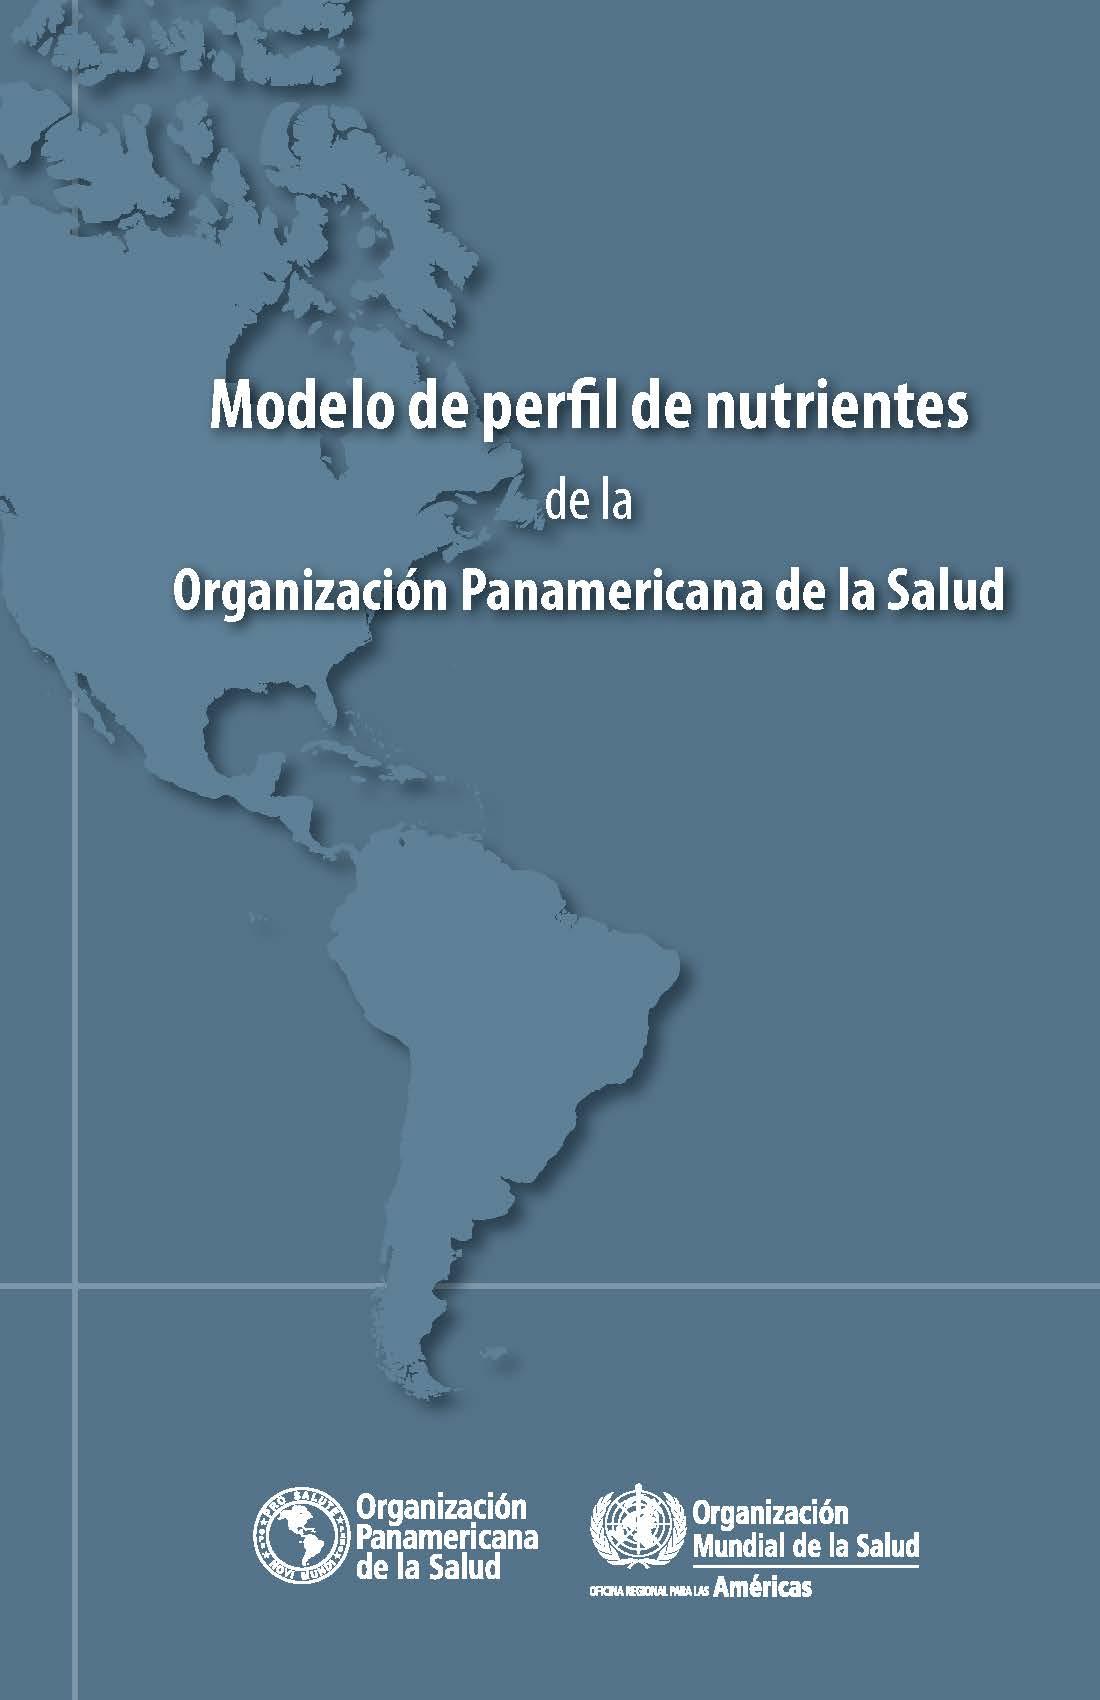 Modelo nutrientes